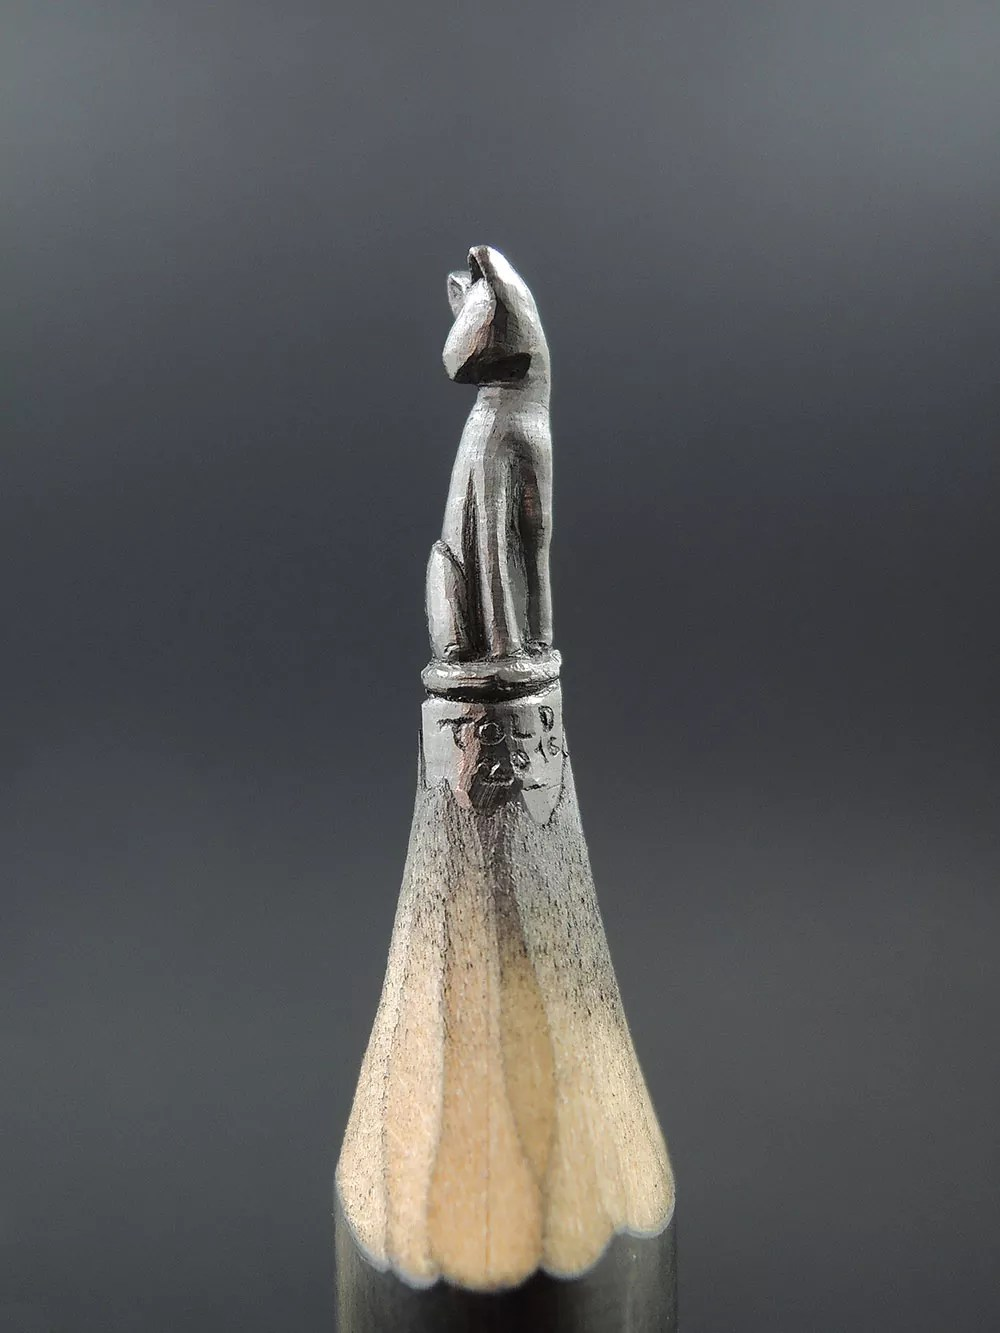 DSCN3962x - New Way of Using Pencil - Jasenko Djordjevic